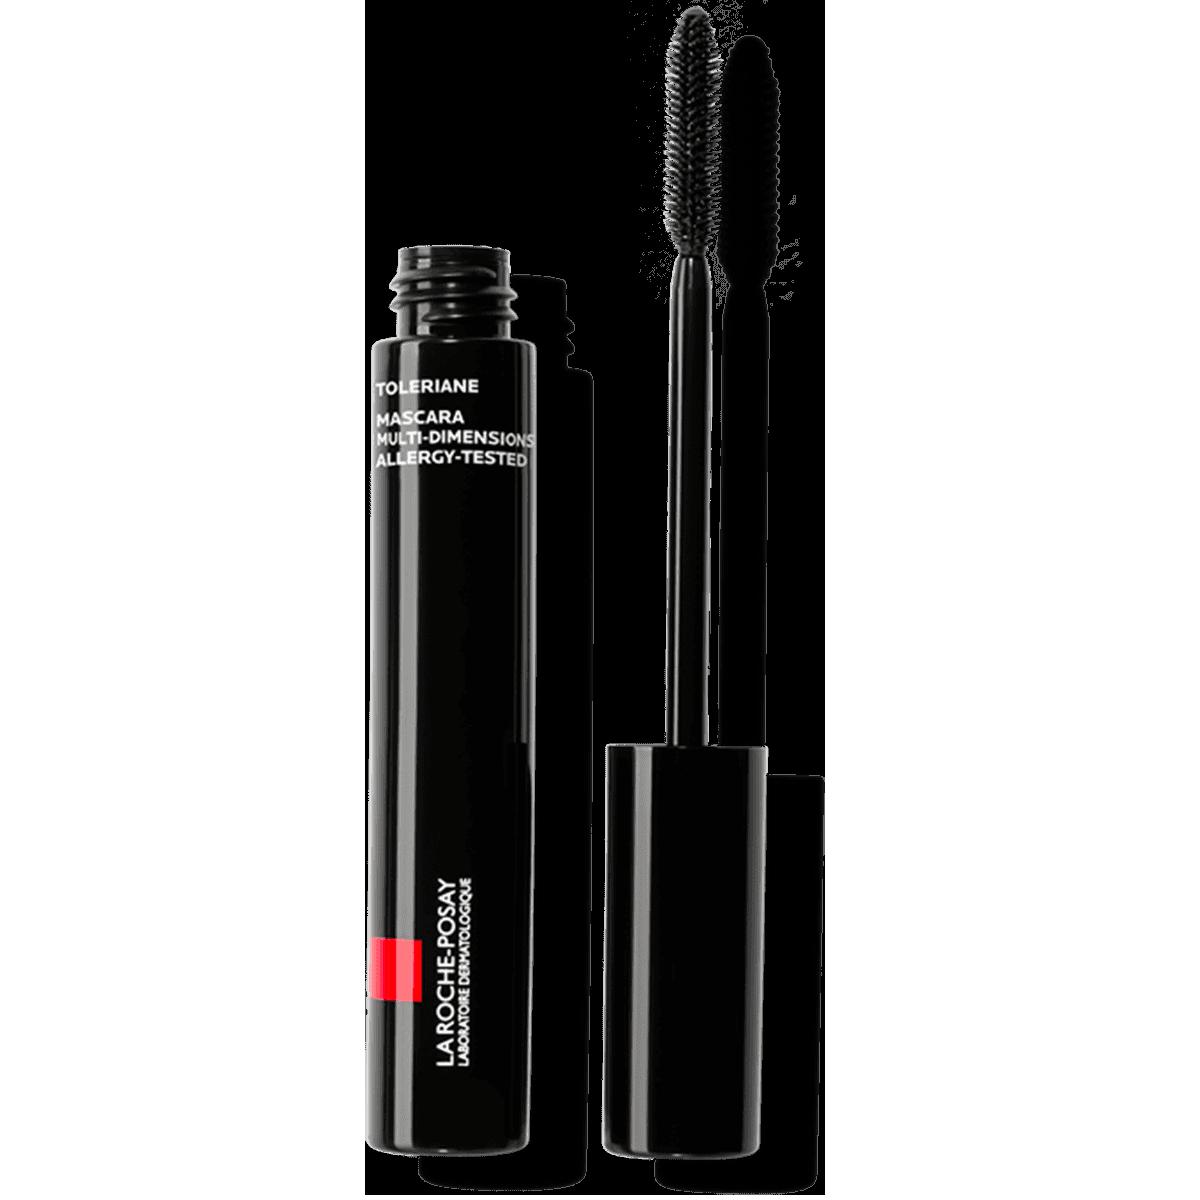 La Roche Posay Citlivá Toleriane Make-up ŘASENKA MULTIDIMENSIONS Black